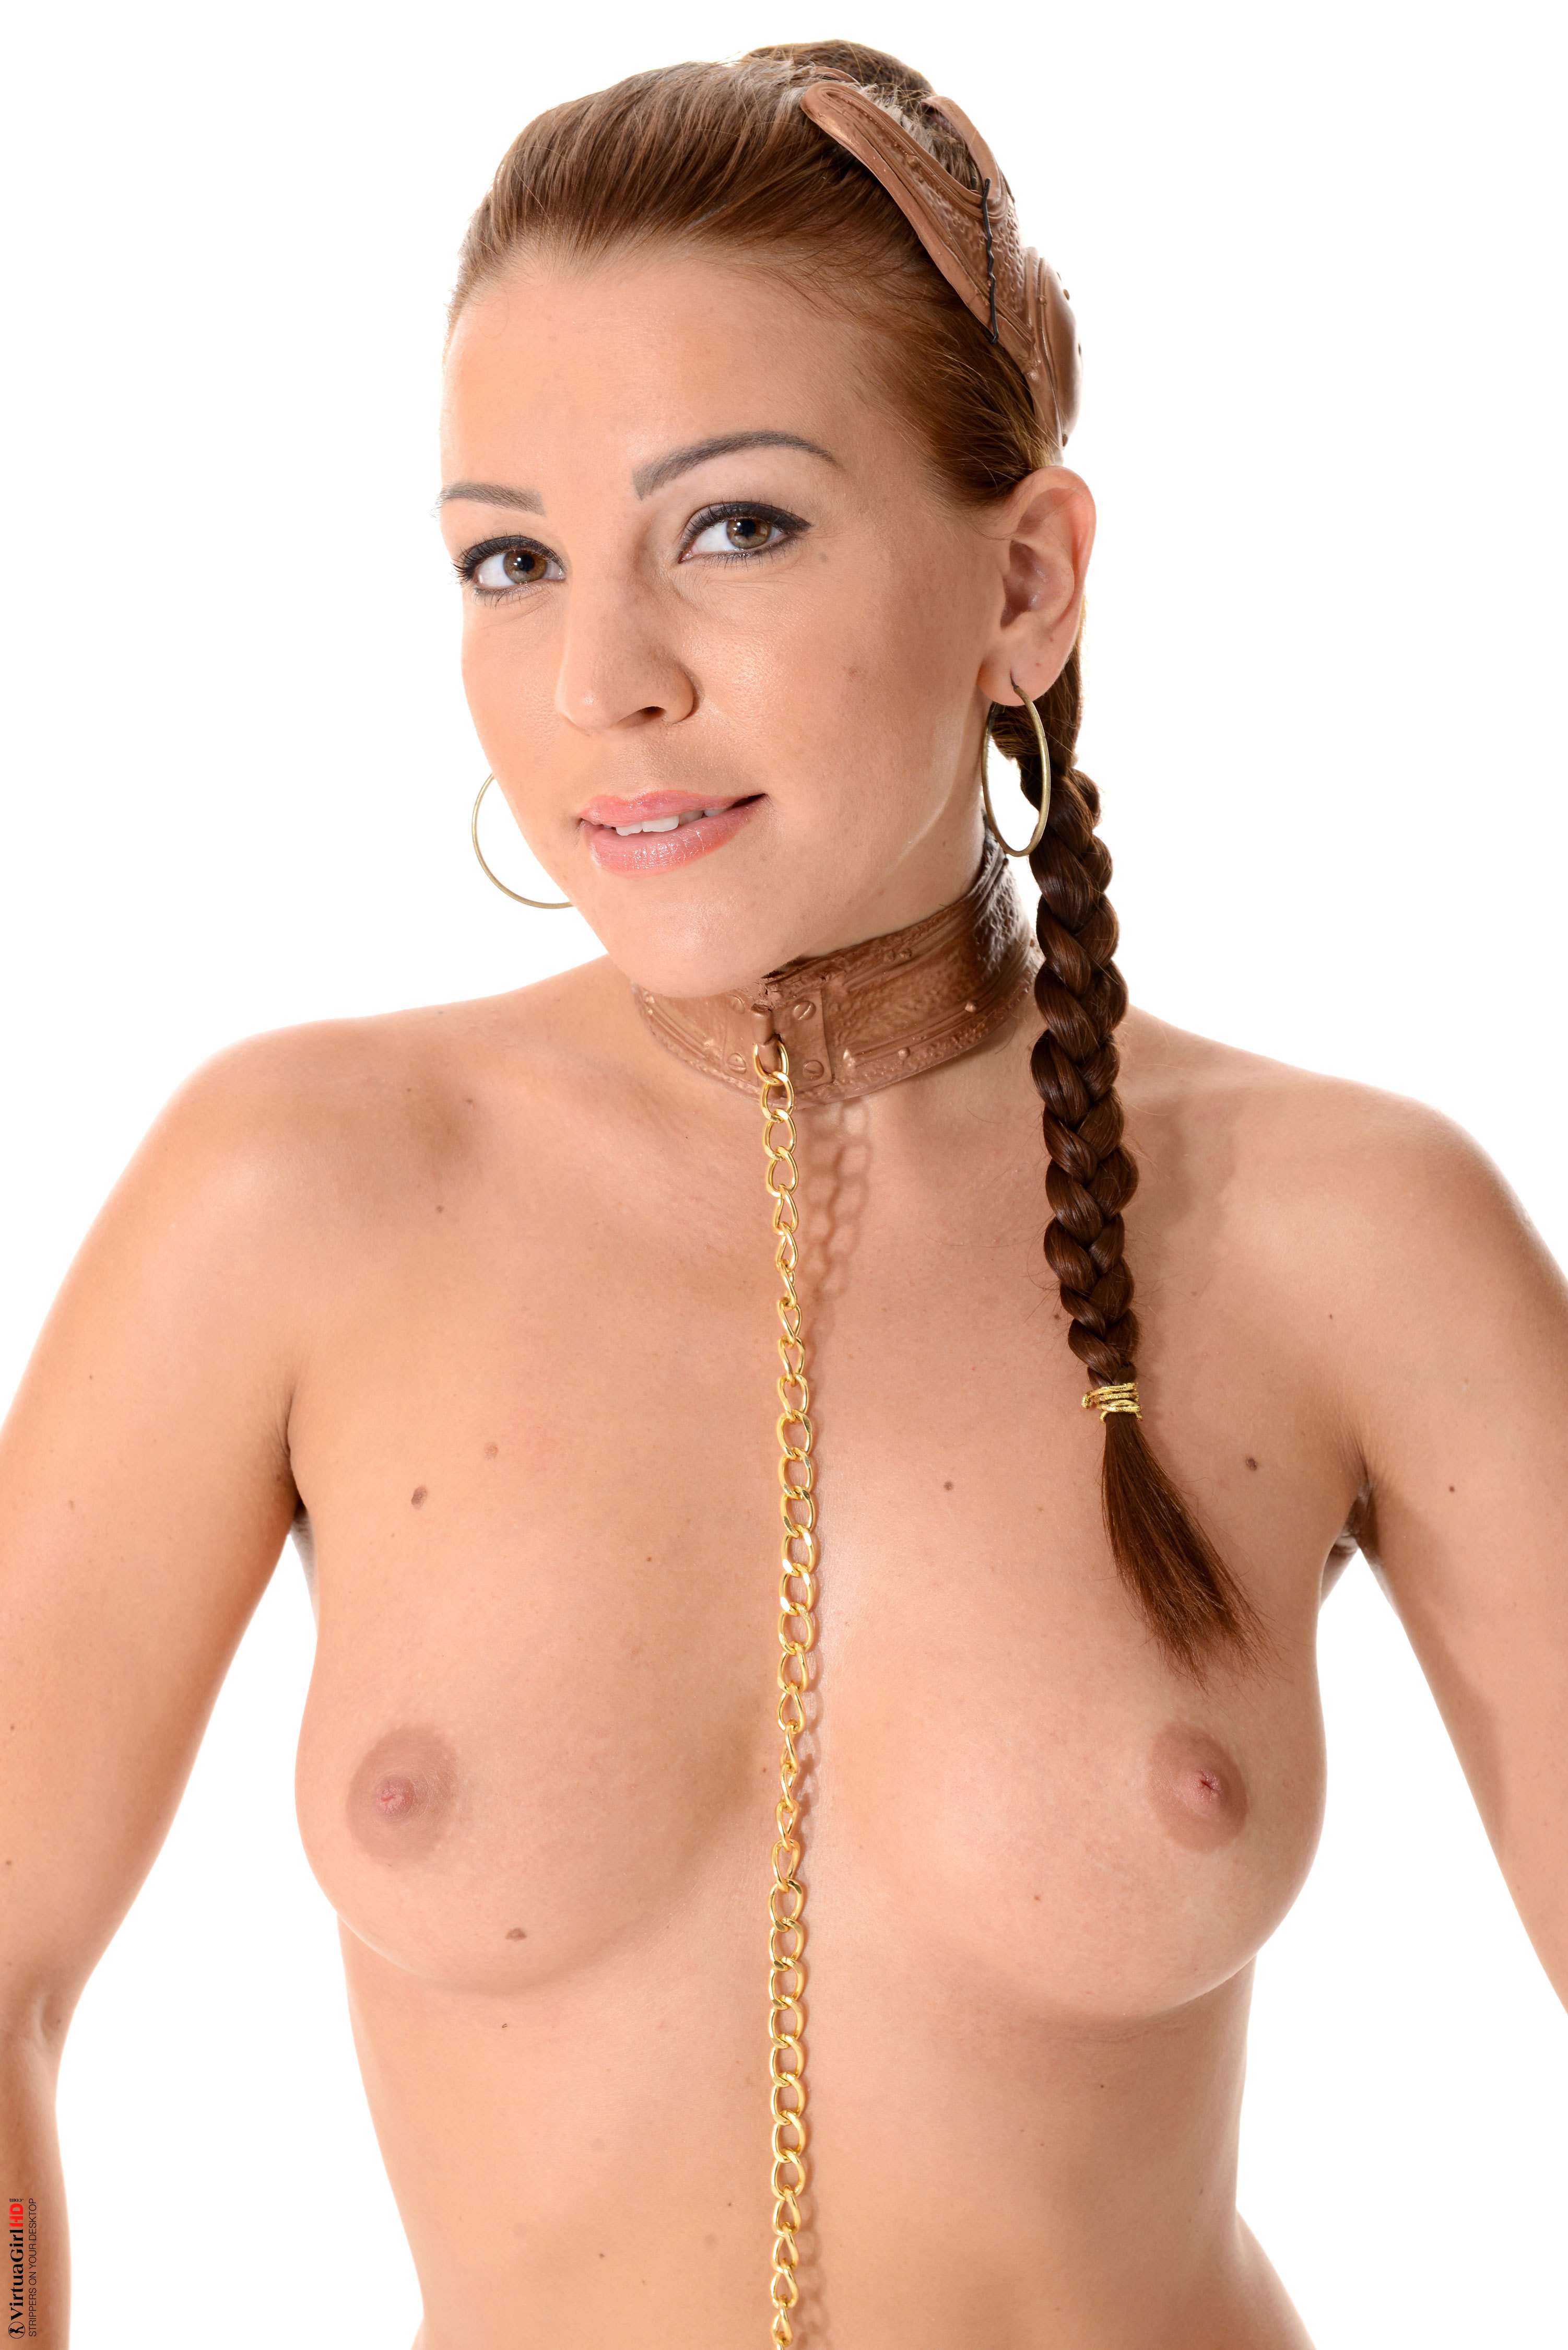 erotic nude hot